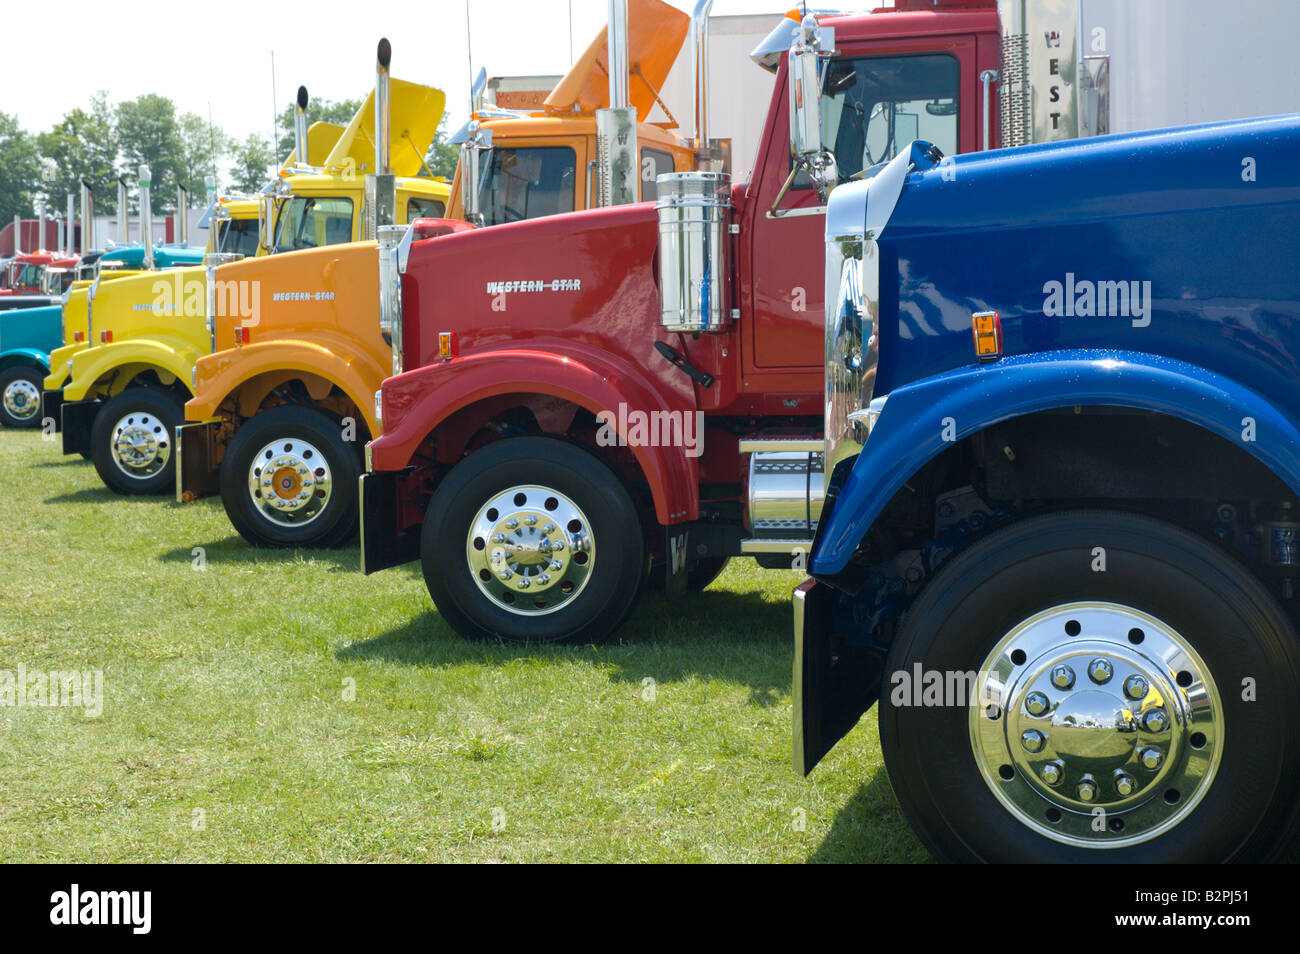 Tractor Trailer Stock : Semi tractor trailer big rig trucks stock photo royalty